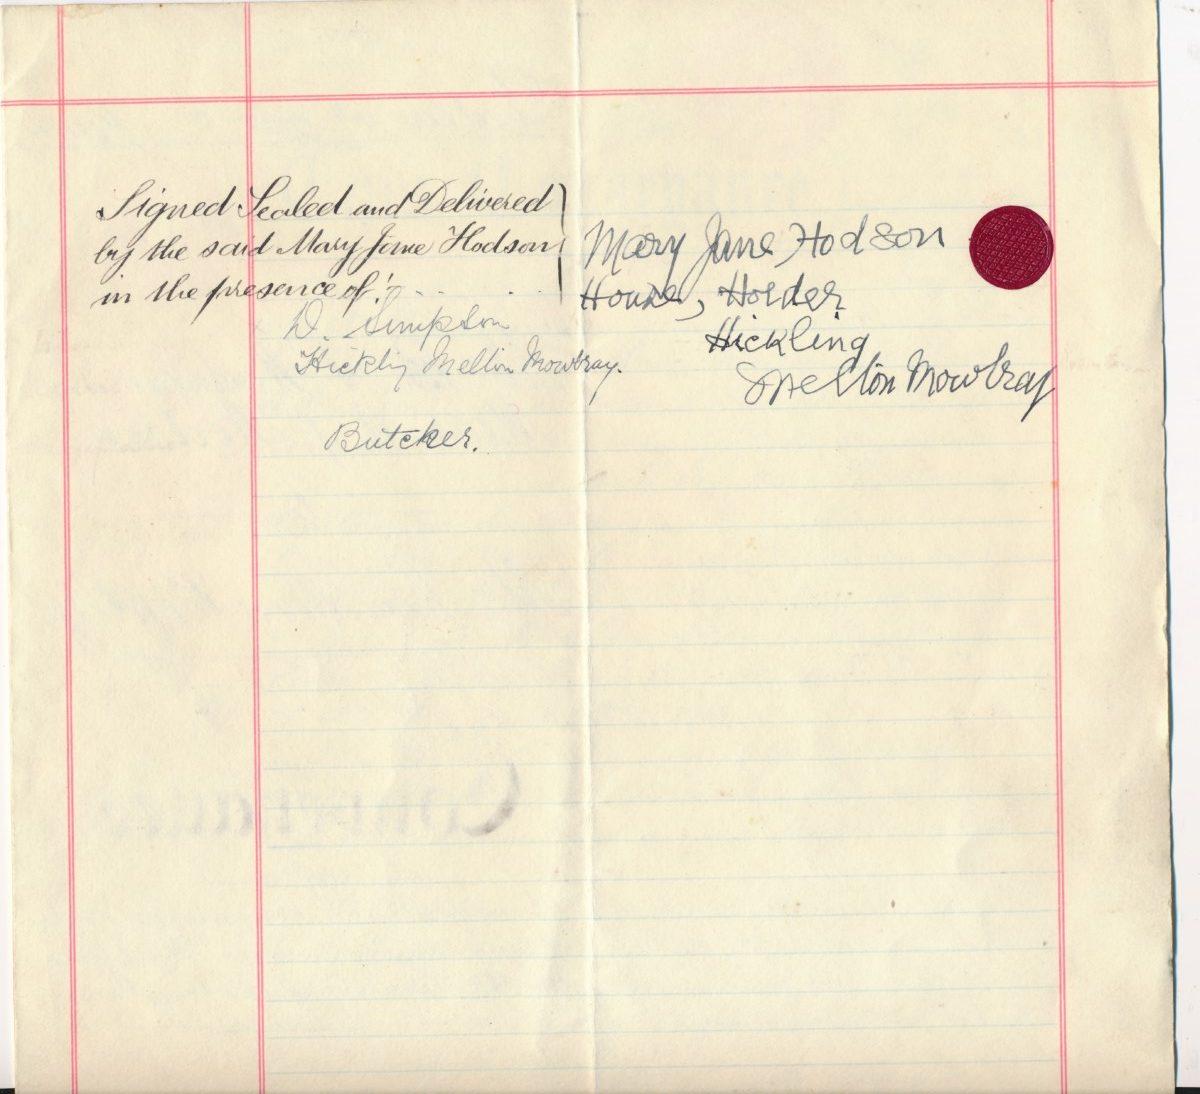 Hodson's Yard: 1944 & 1960 conveyance